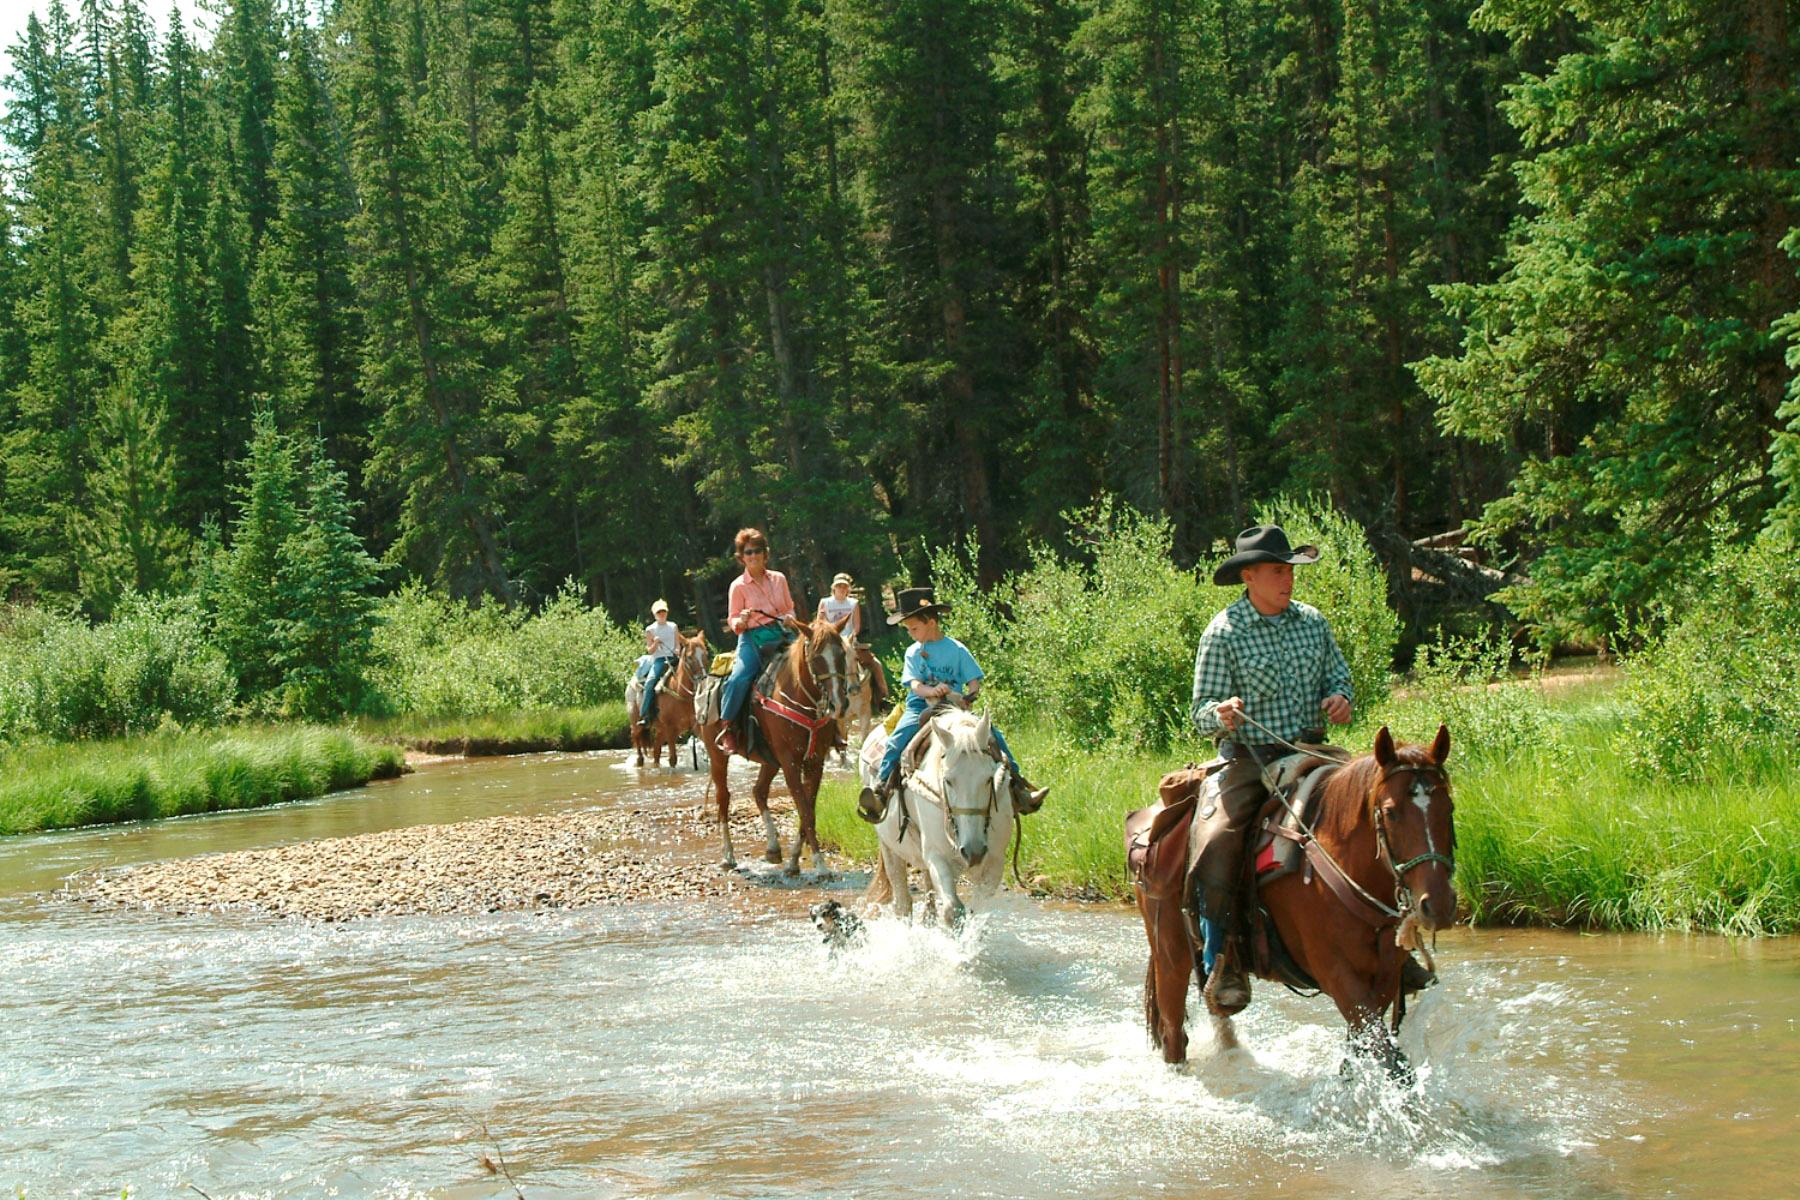 Tumbling River Creek Crossing Family Ranch Vacations